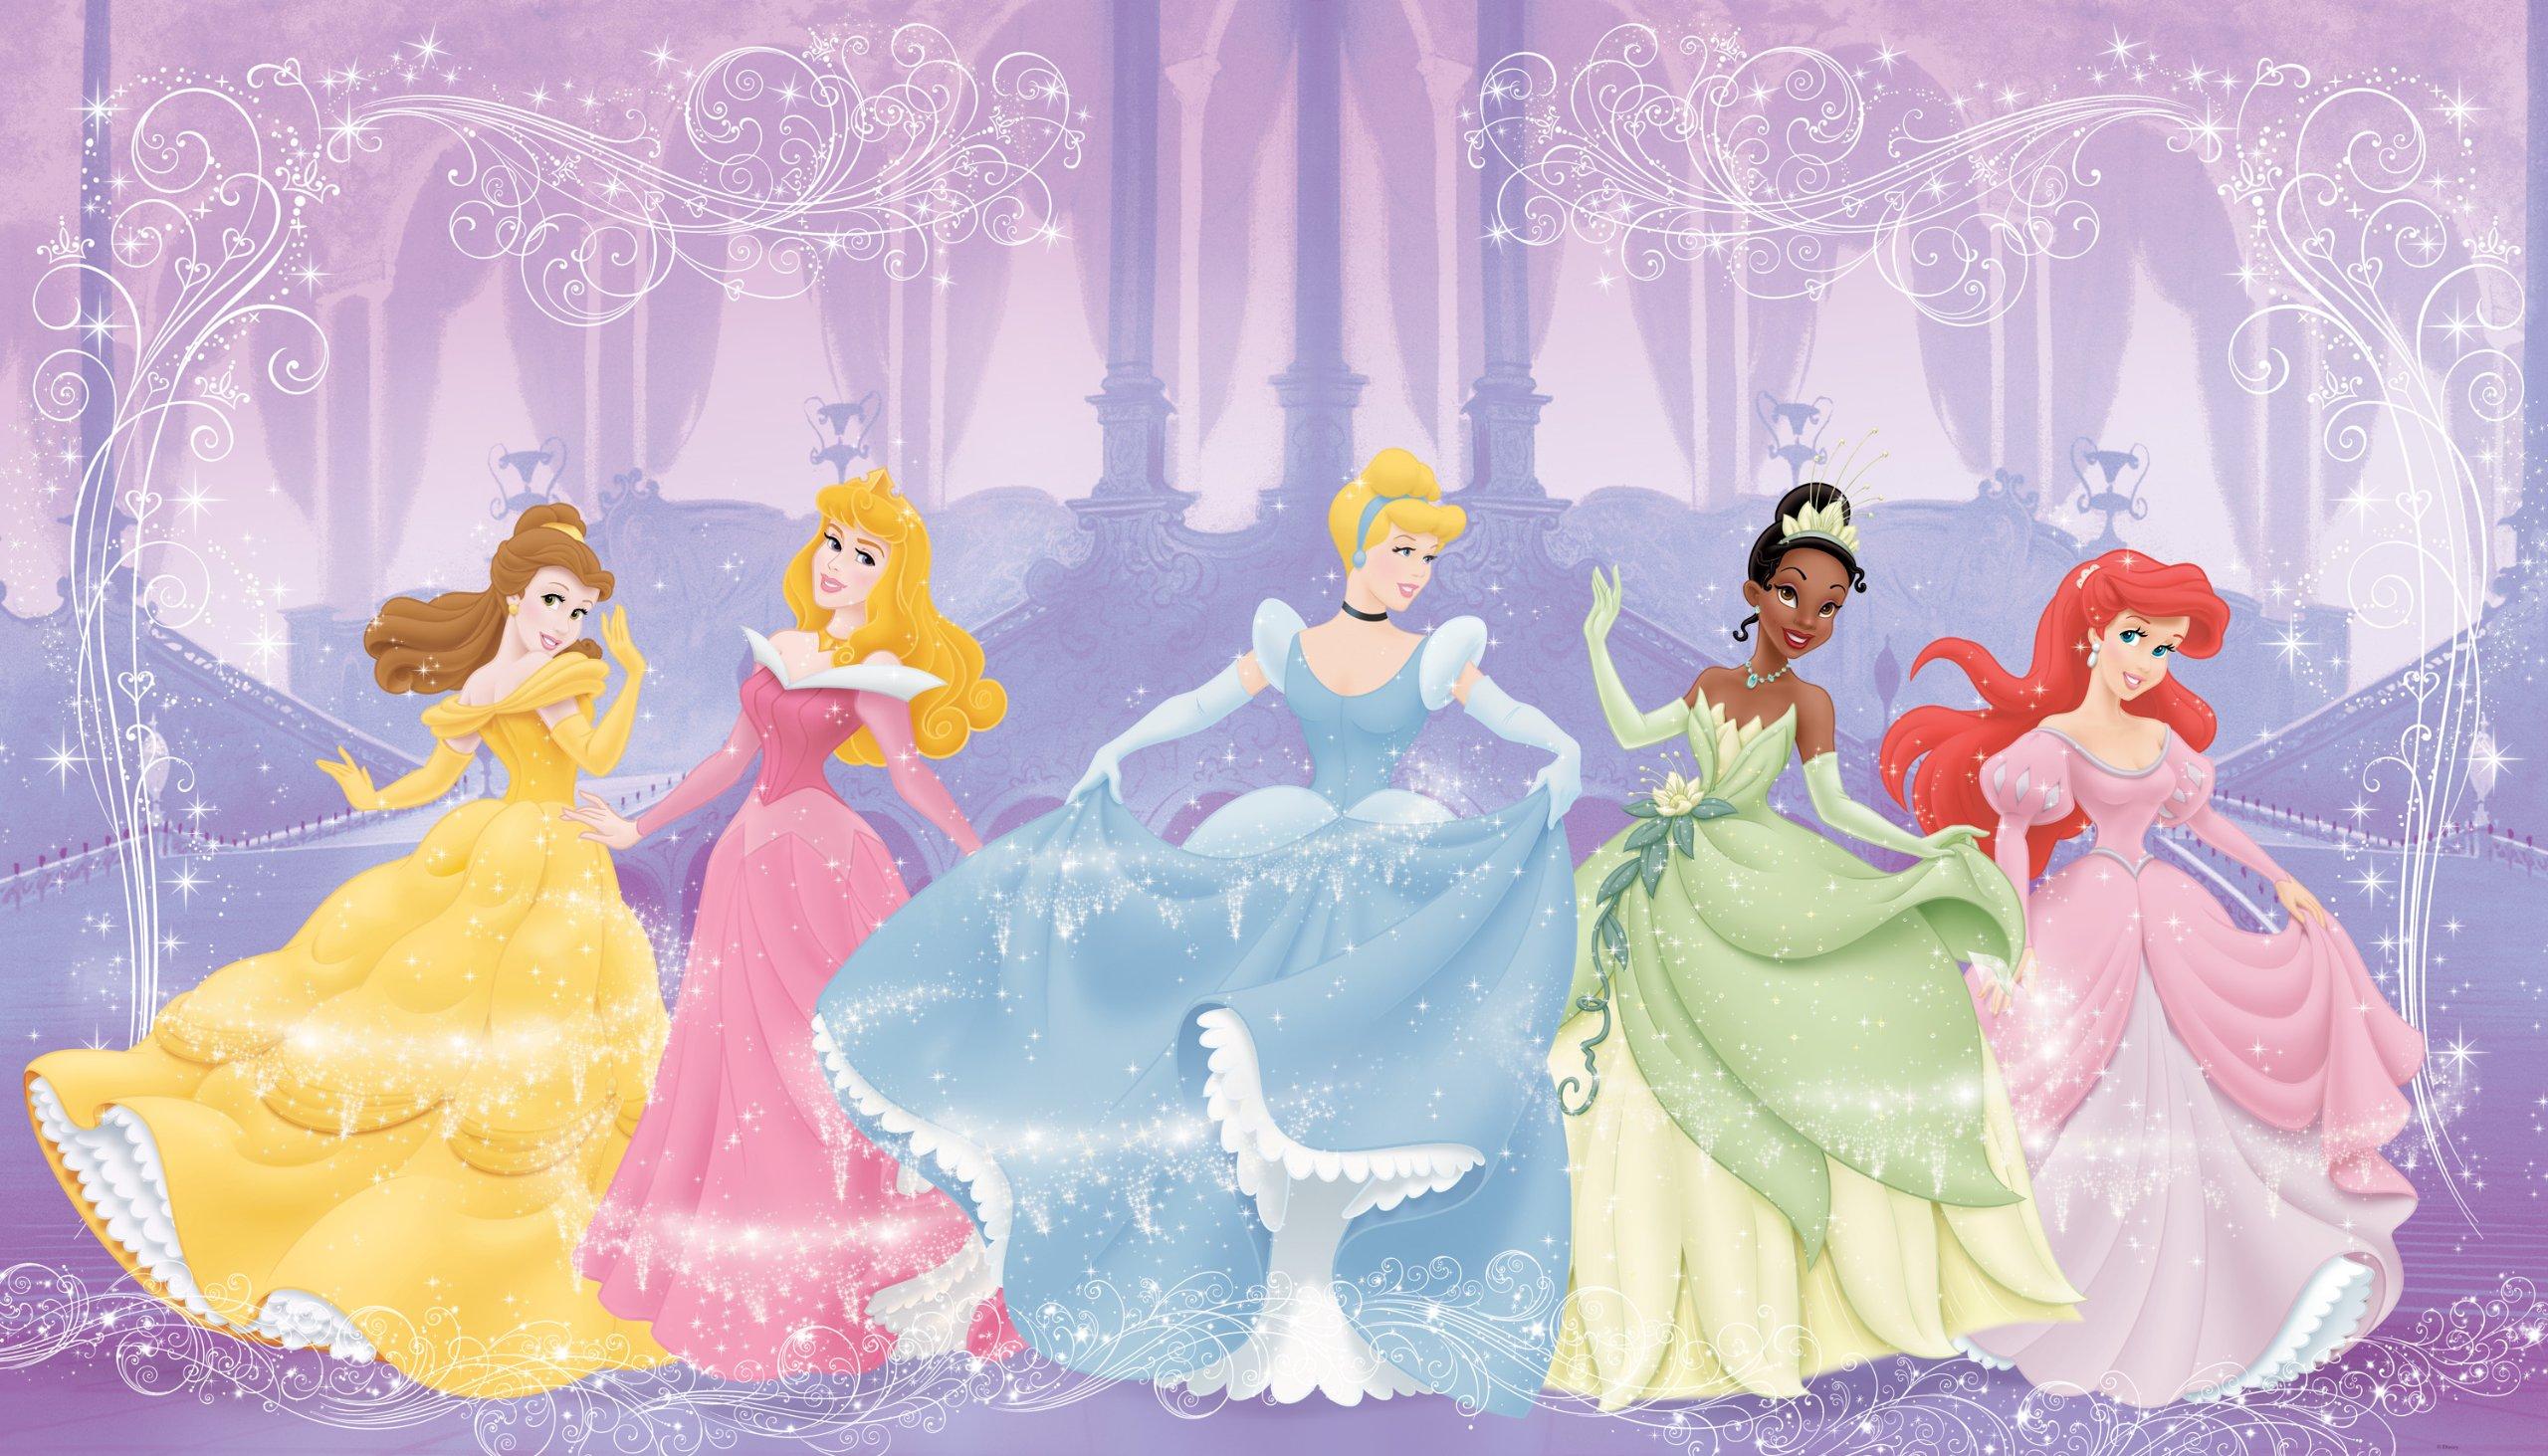 RoomMates JL1226M Disney Perfect Princess 6-Foot-by-10.5-Foot Prepasted Wall Mural by RoomMates